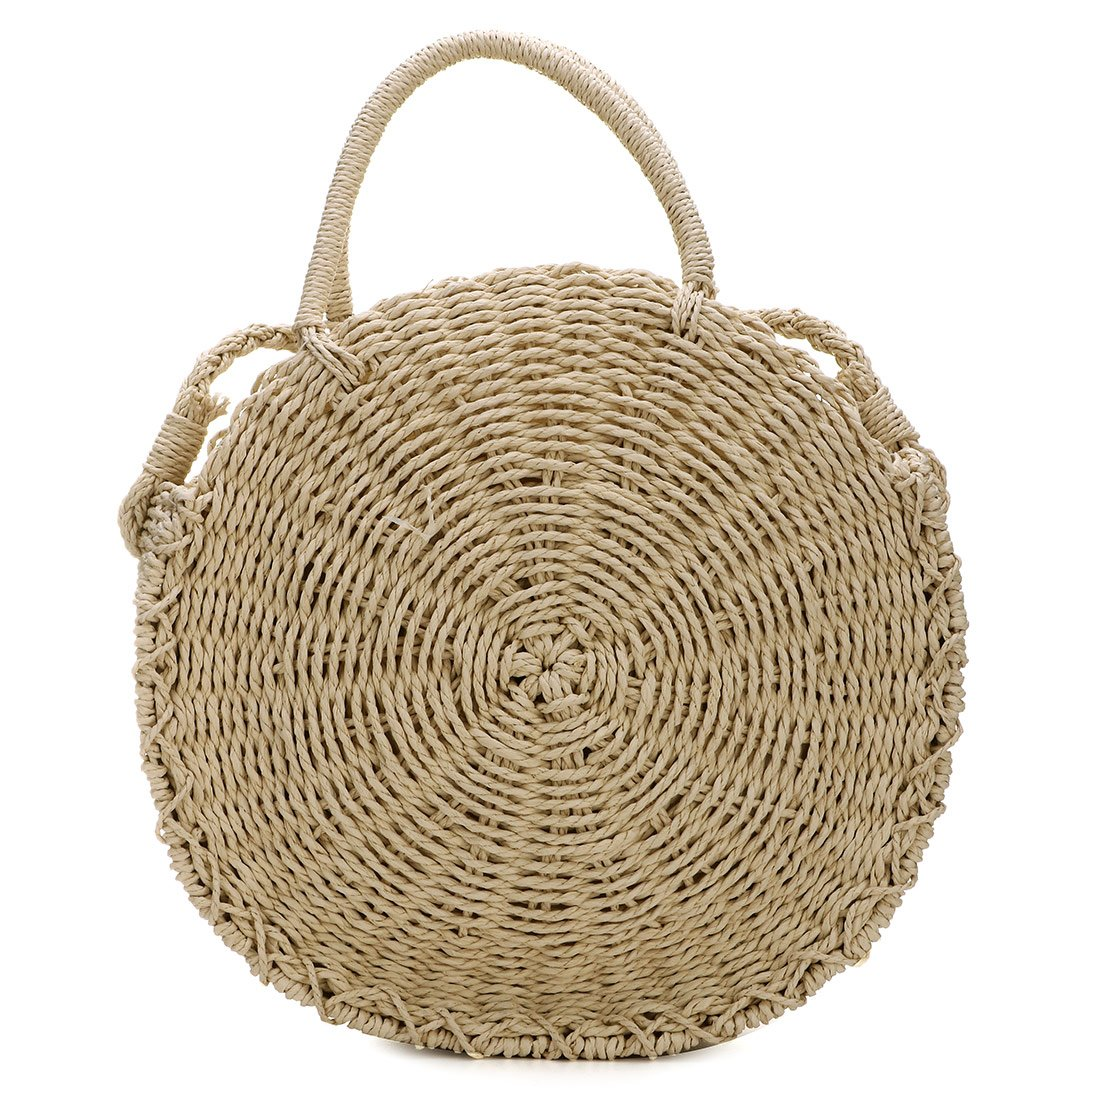 Straw Crossbody Bag Women Weave Shoulder Bag Round Summer Beach Purse and Handbags (Khaki)